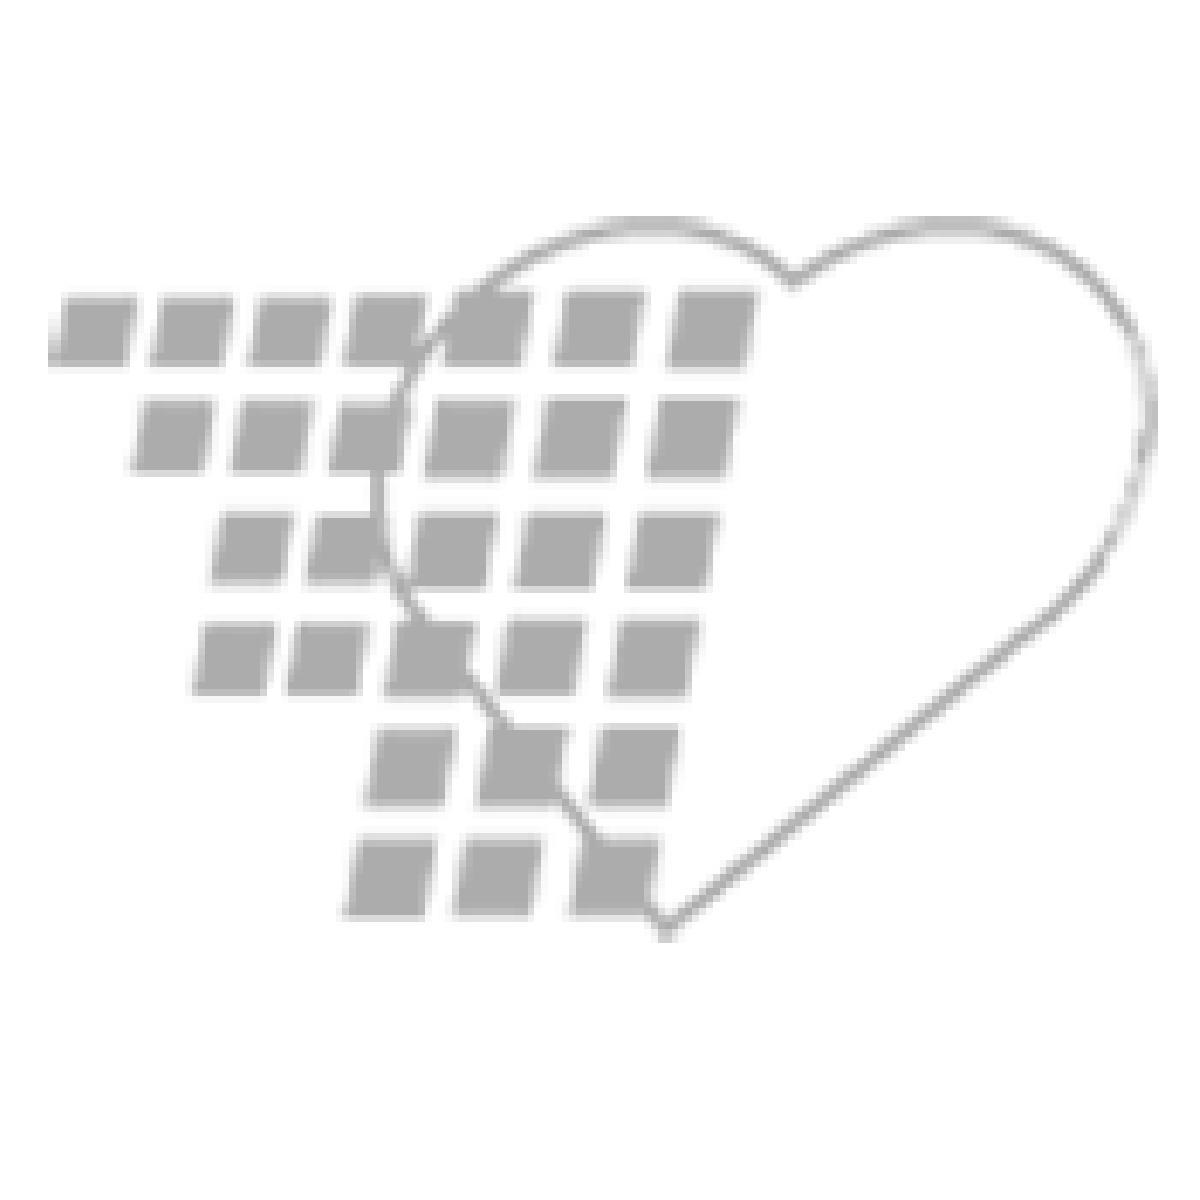 06-11-1118 Pocket Nurse® Safety Needle Only Bundle